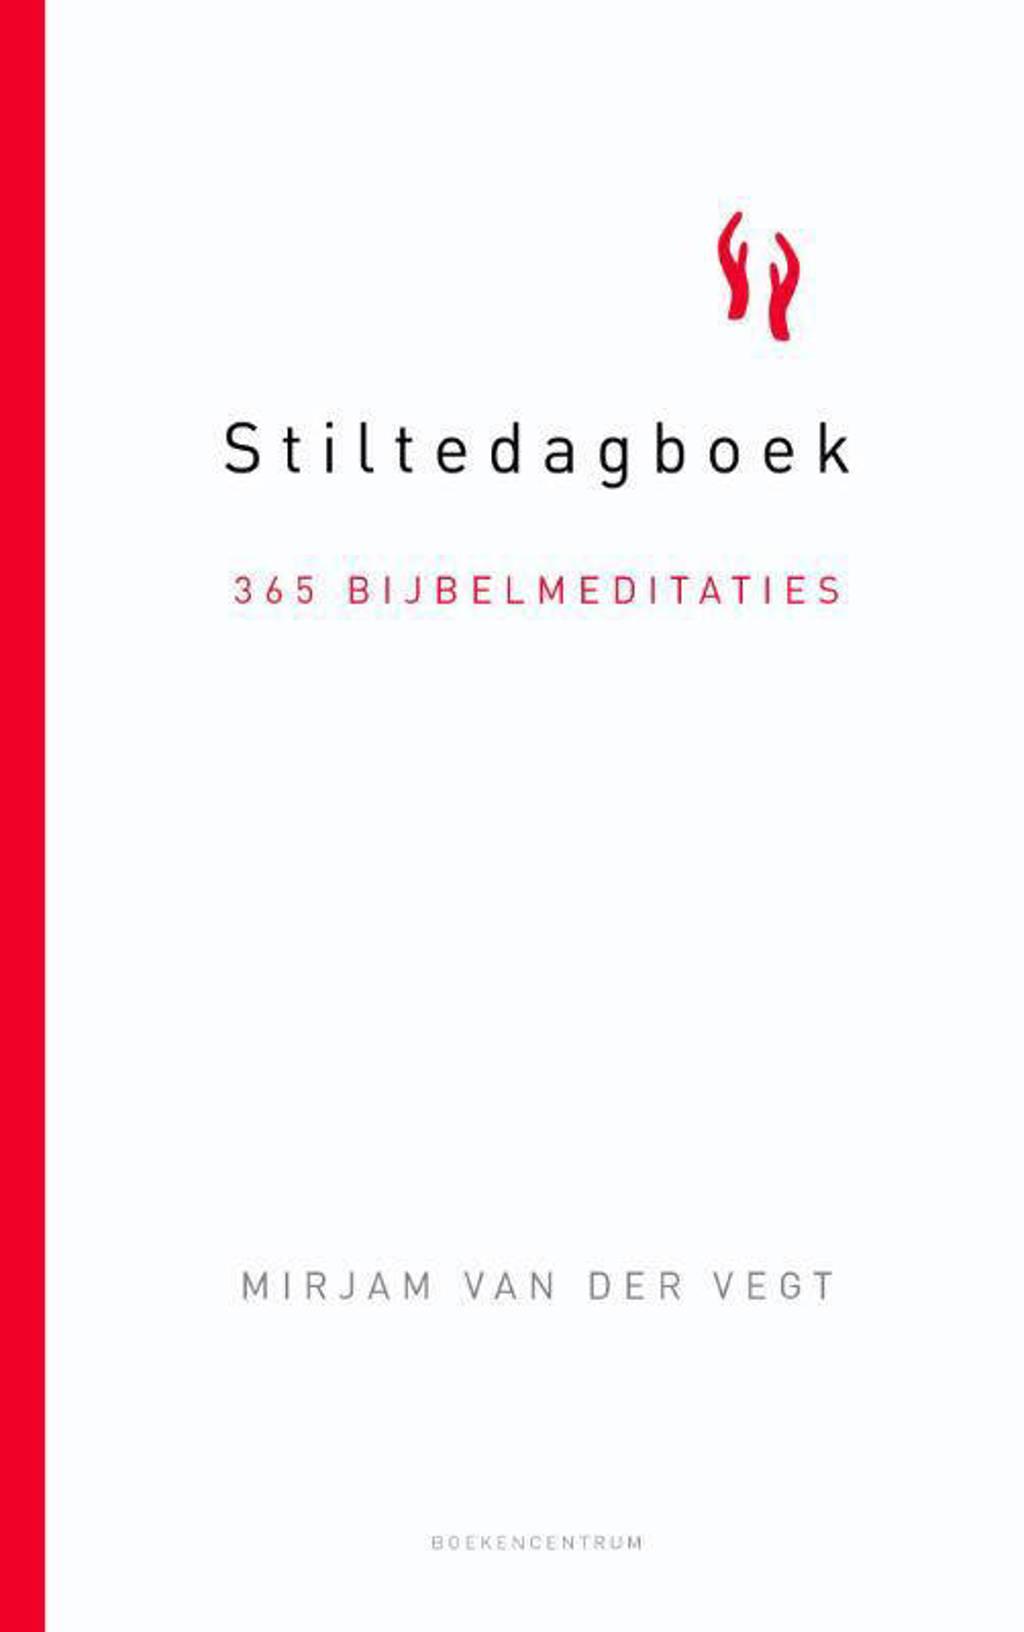 Stiltedagboek - Mirjam van der Vegt